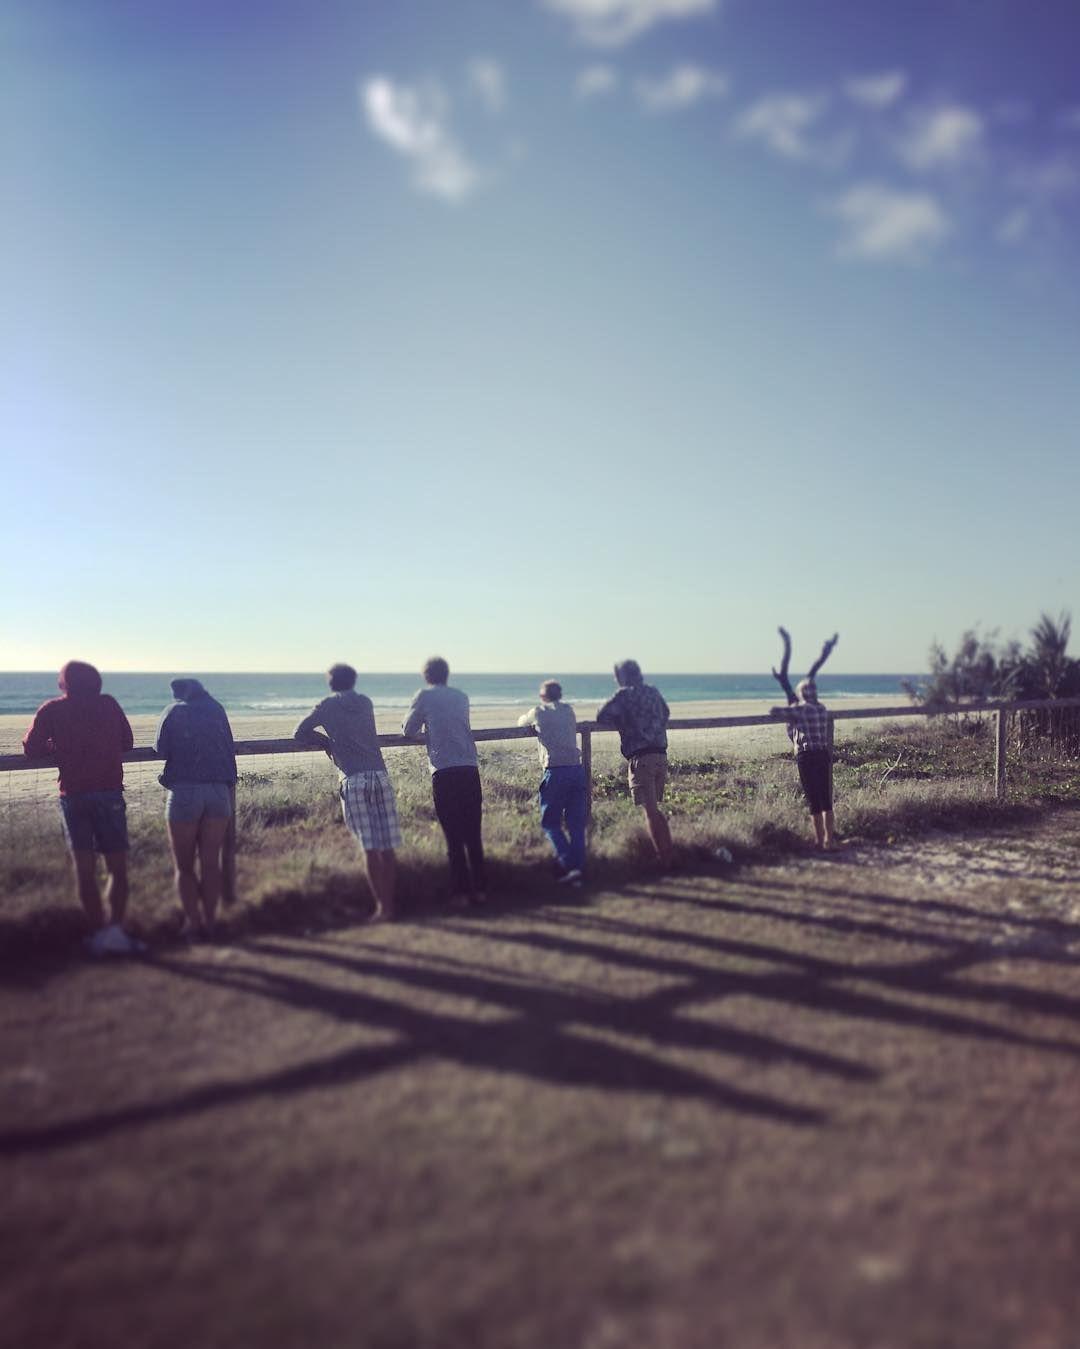 morning surf check. #whenthewavesarecrazy #surf #boyzone #wherearethesurfchicks #surfing #beach #australia #waves #currumbinbeach #goldcoast #sky by mesmerizingfiend http://ift.tt/1X9mXhV